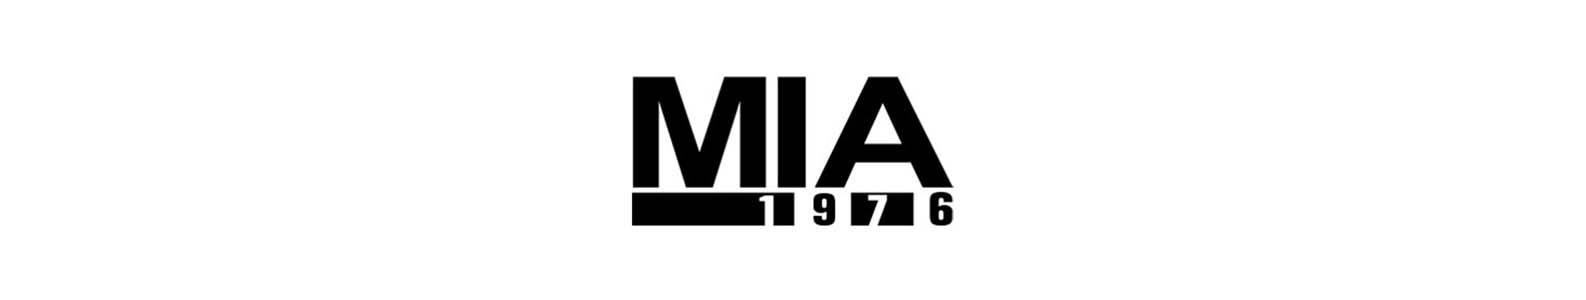 MIA brand header image